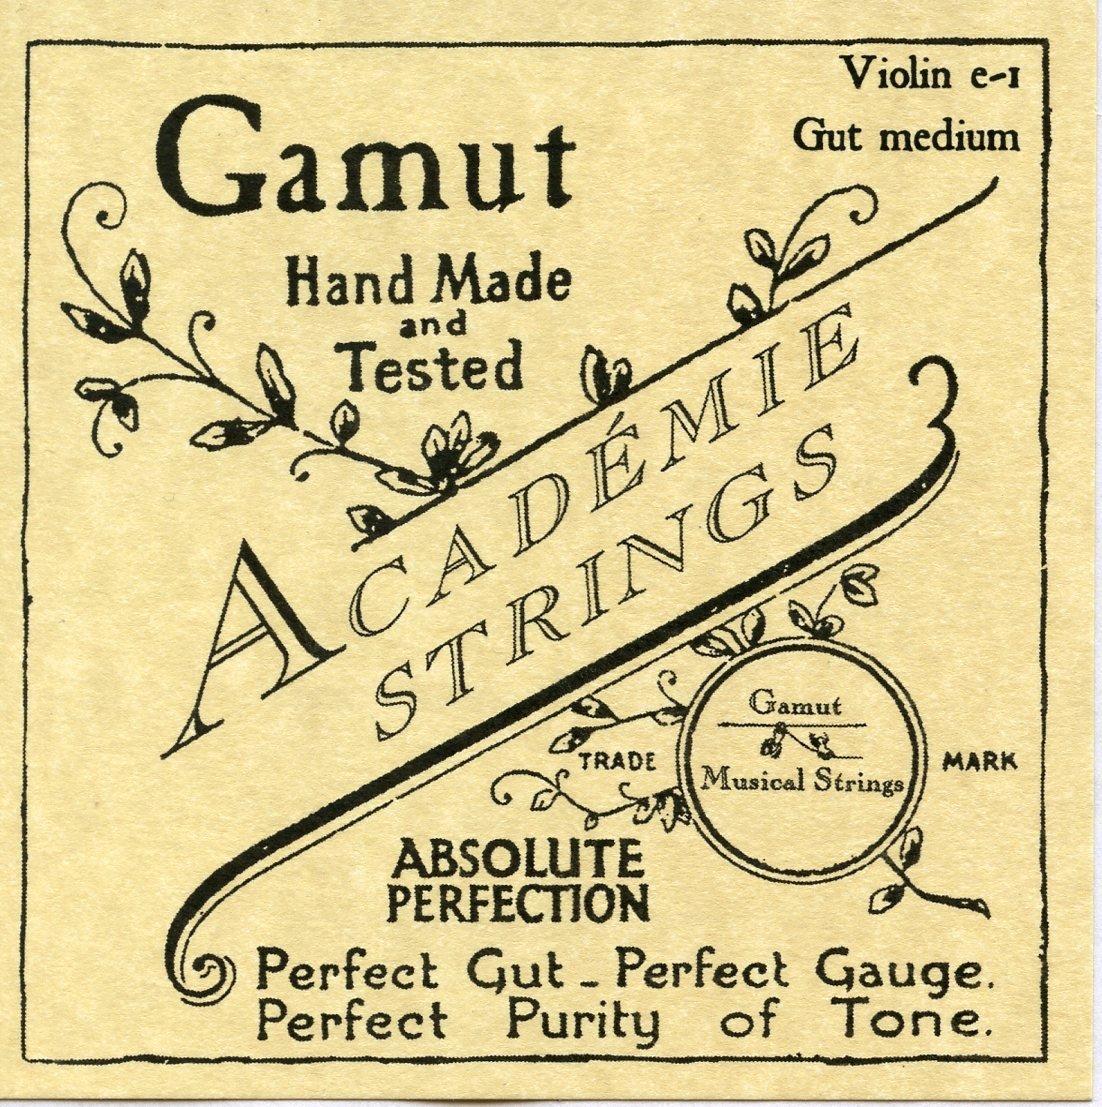 Academie Violin e-1 Gut Medium Gauge